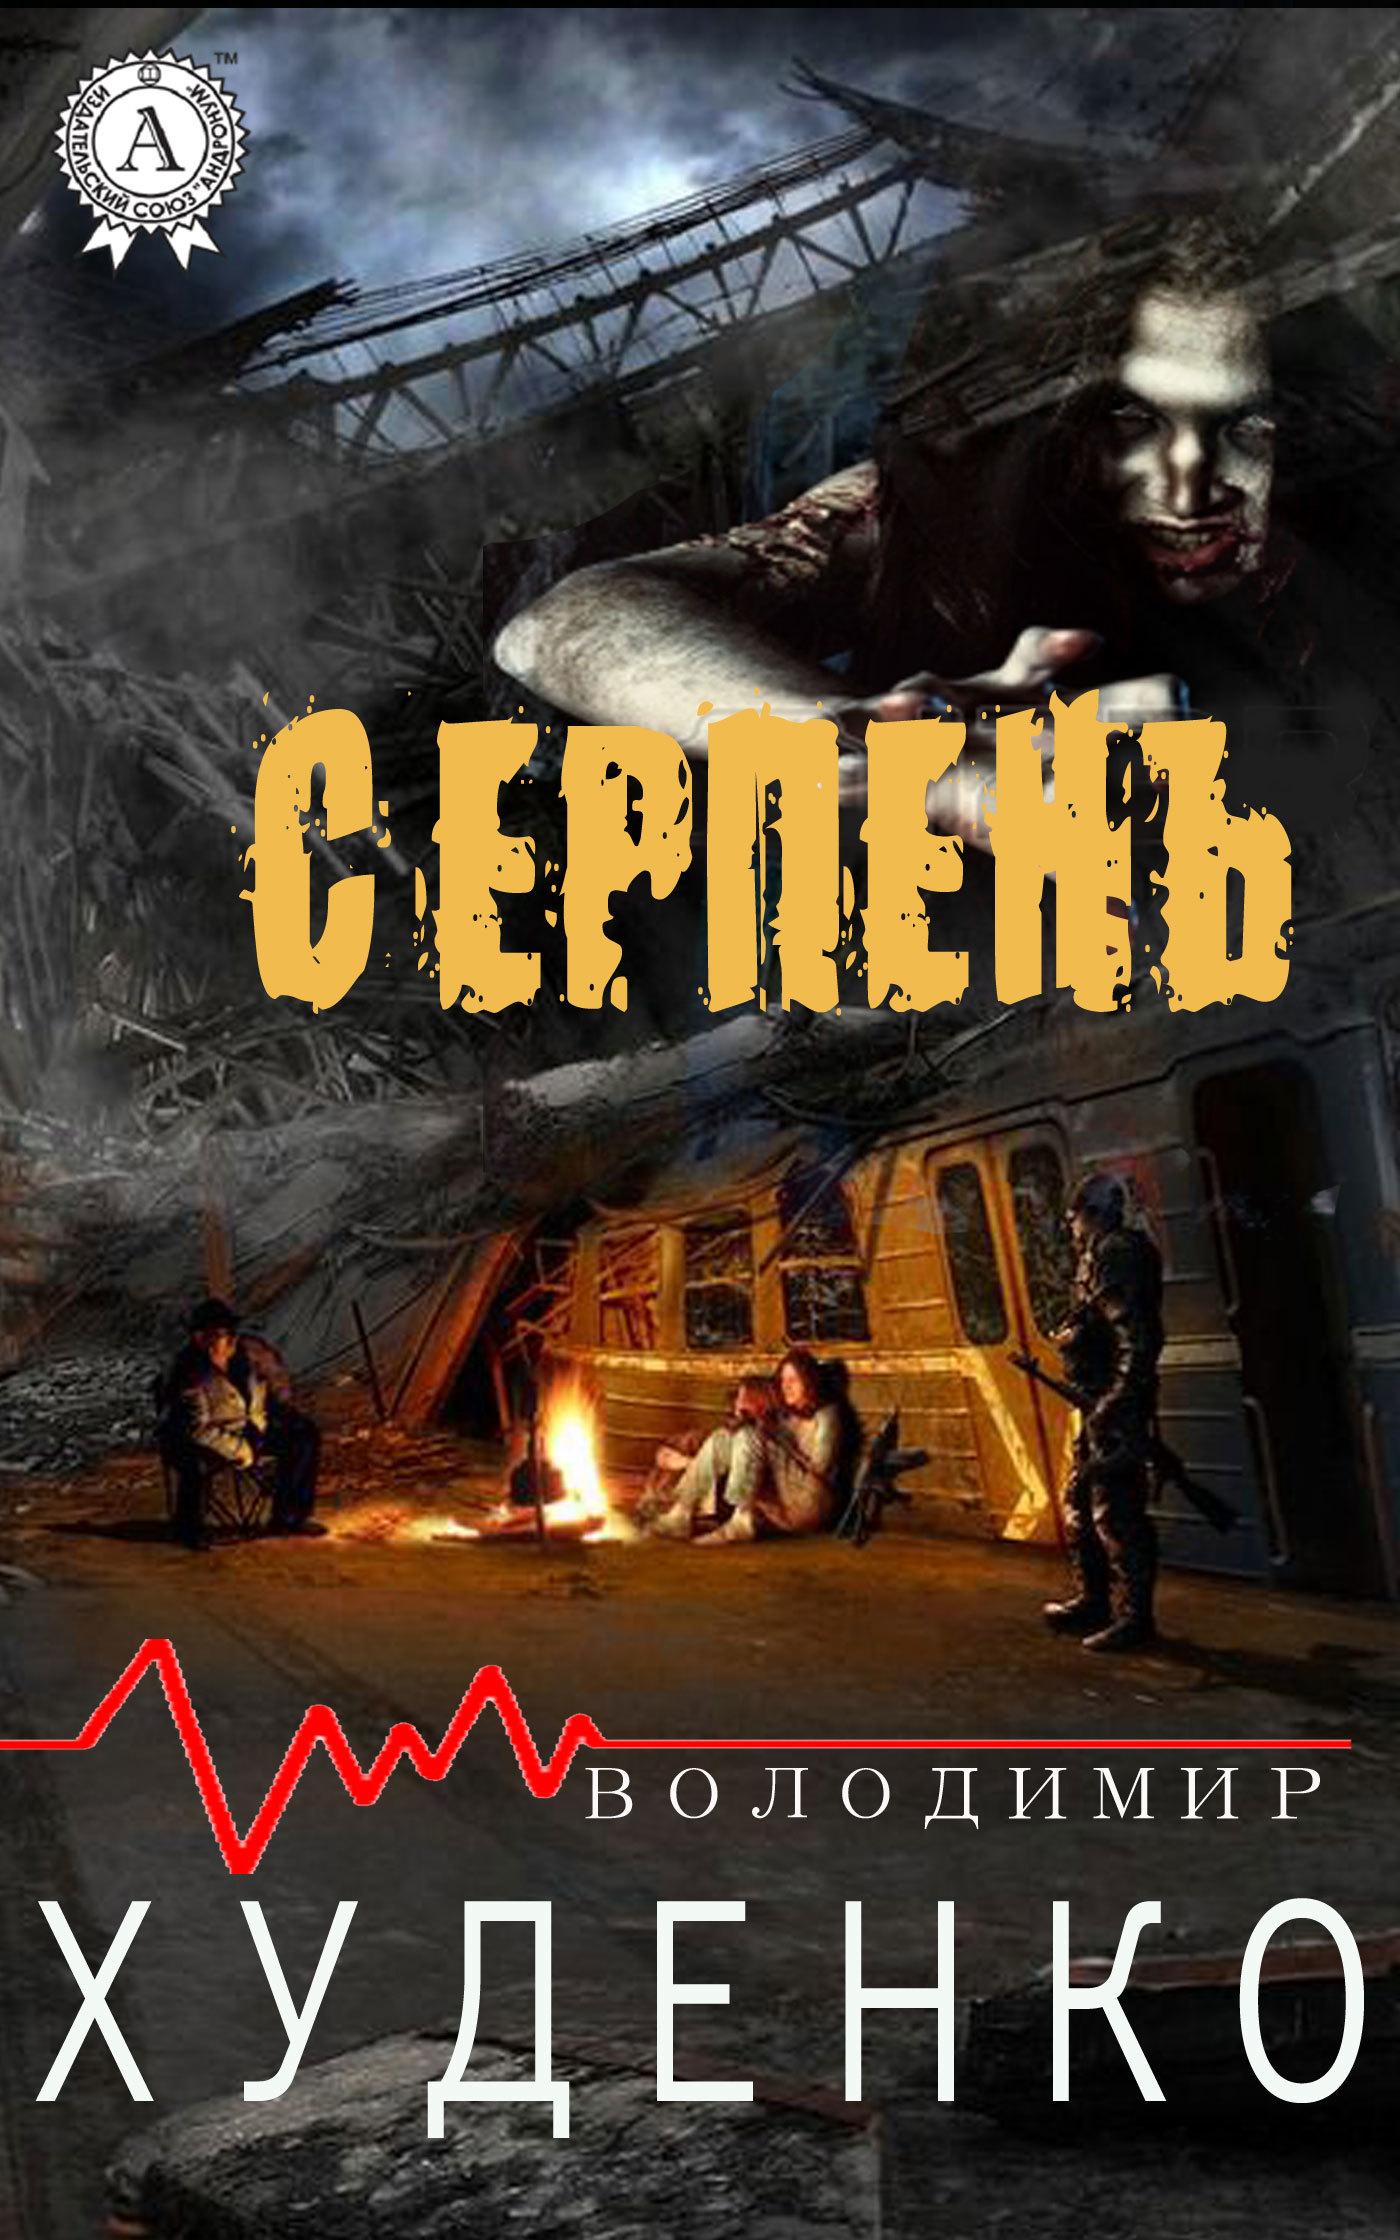 Володимир Худенко Серпень